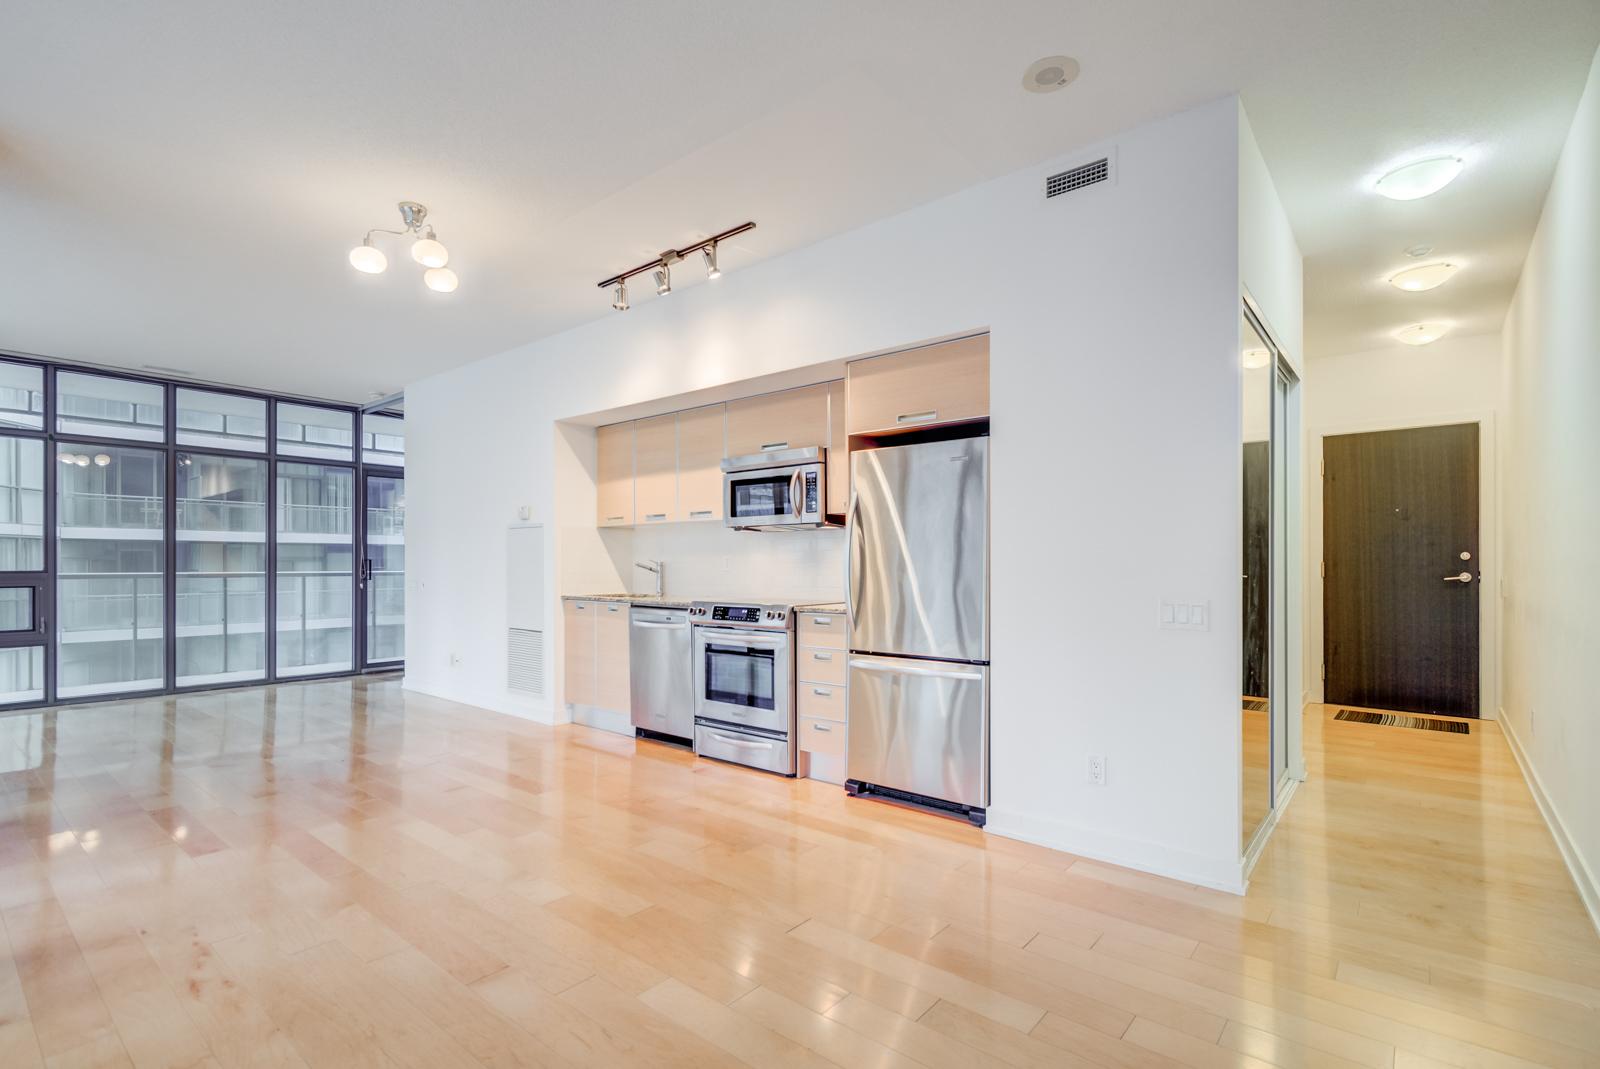 33 Charles St E kitchen and appliances